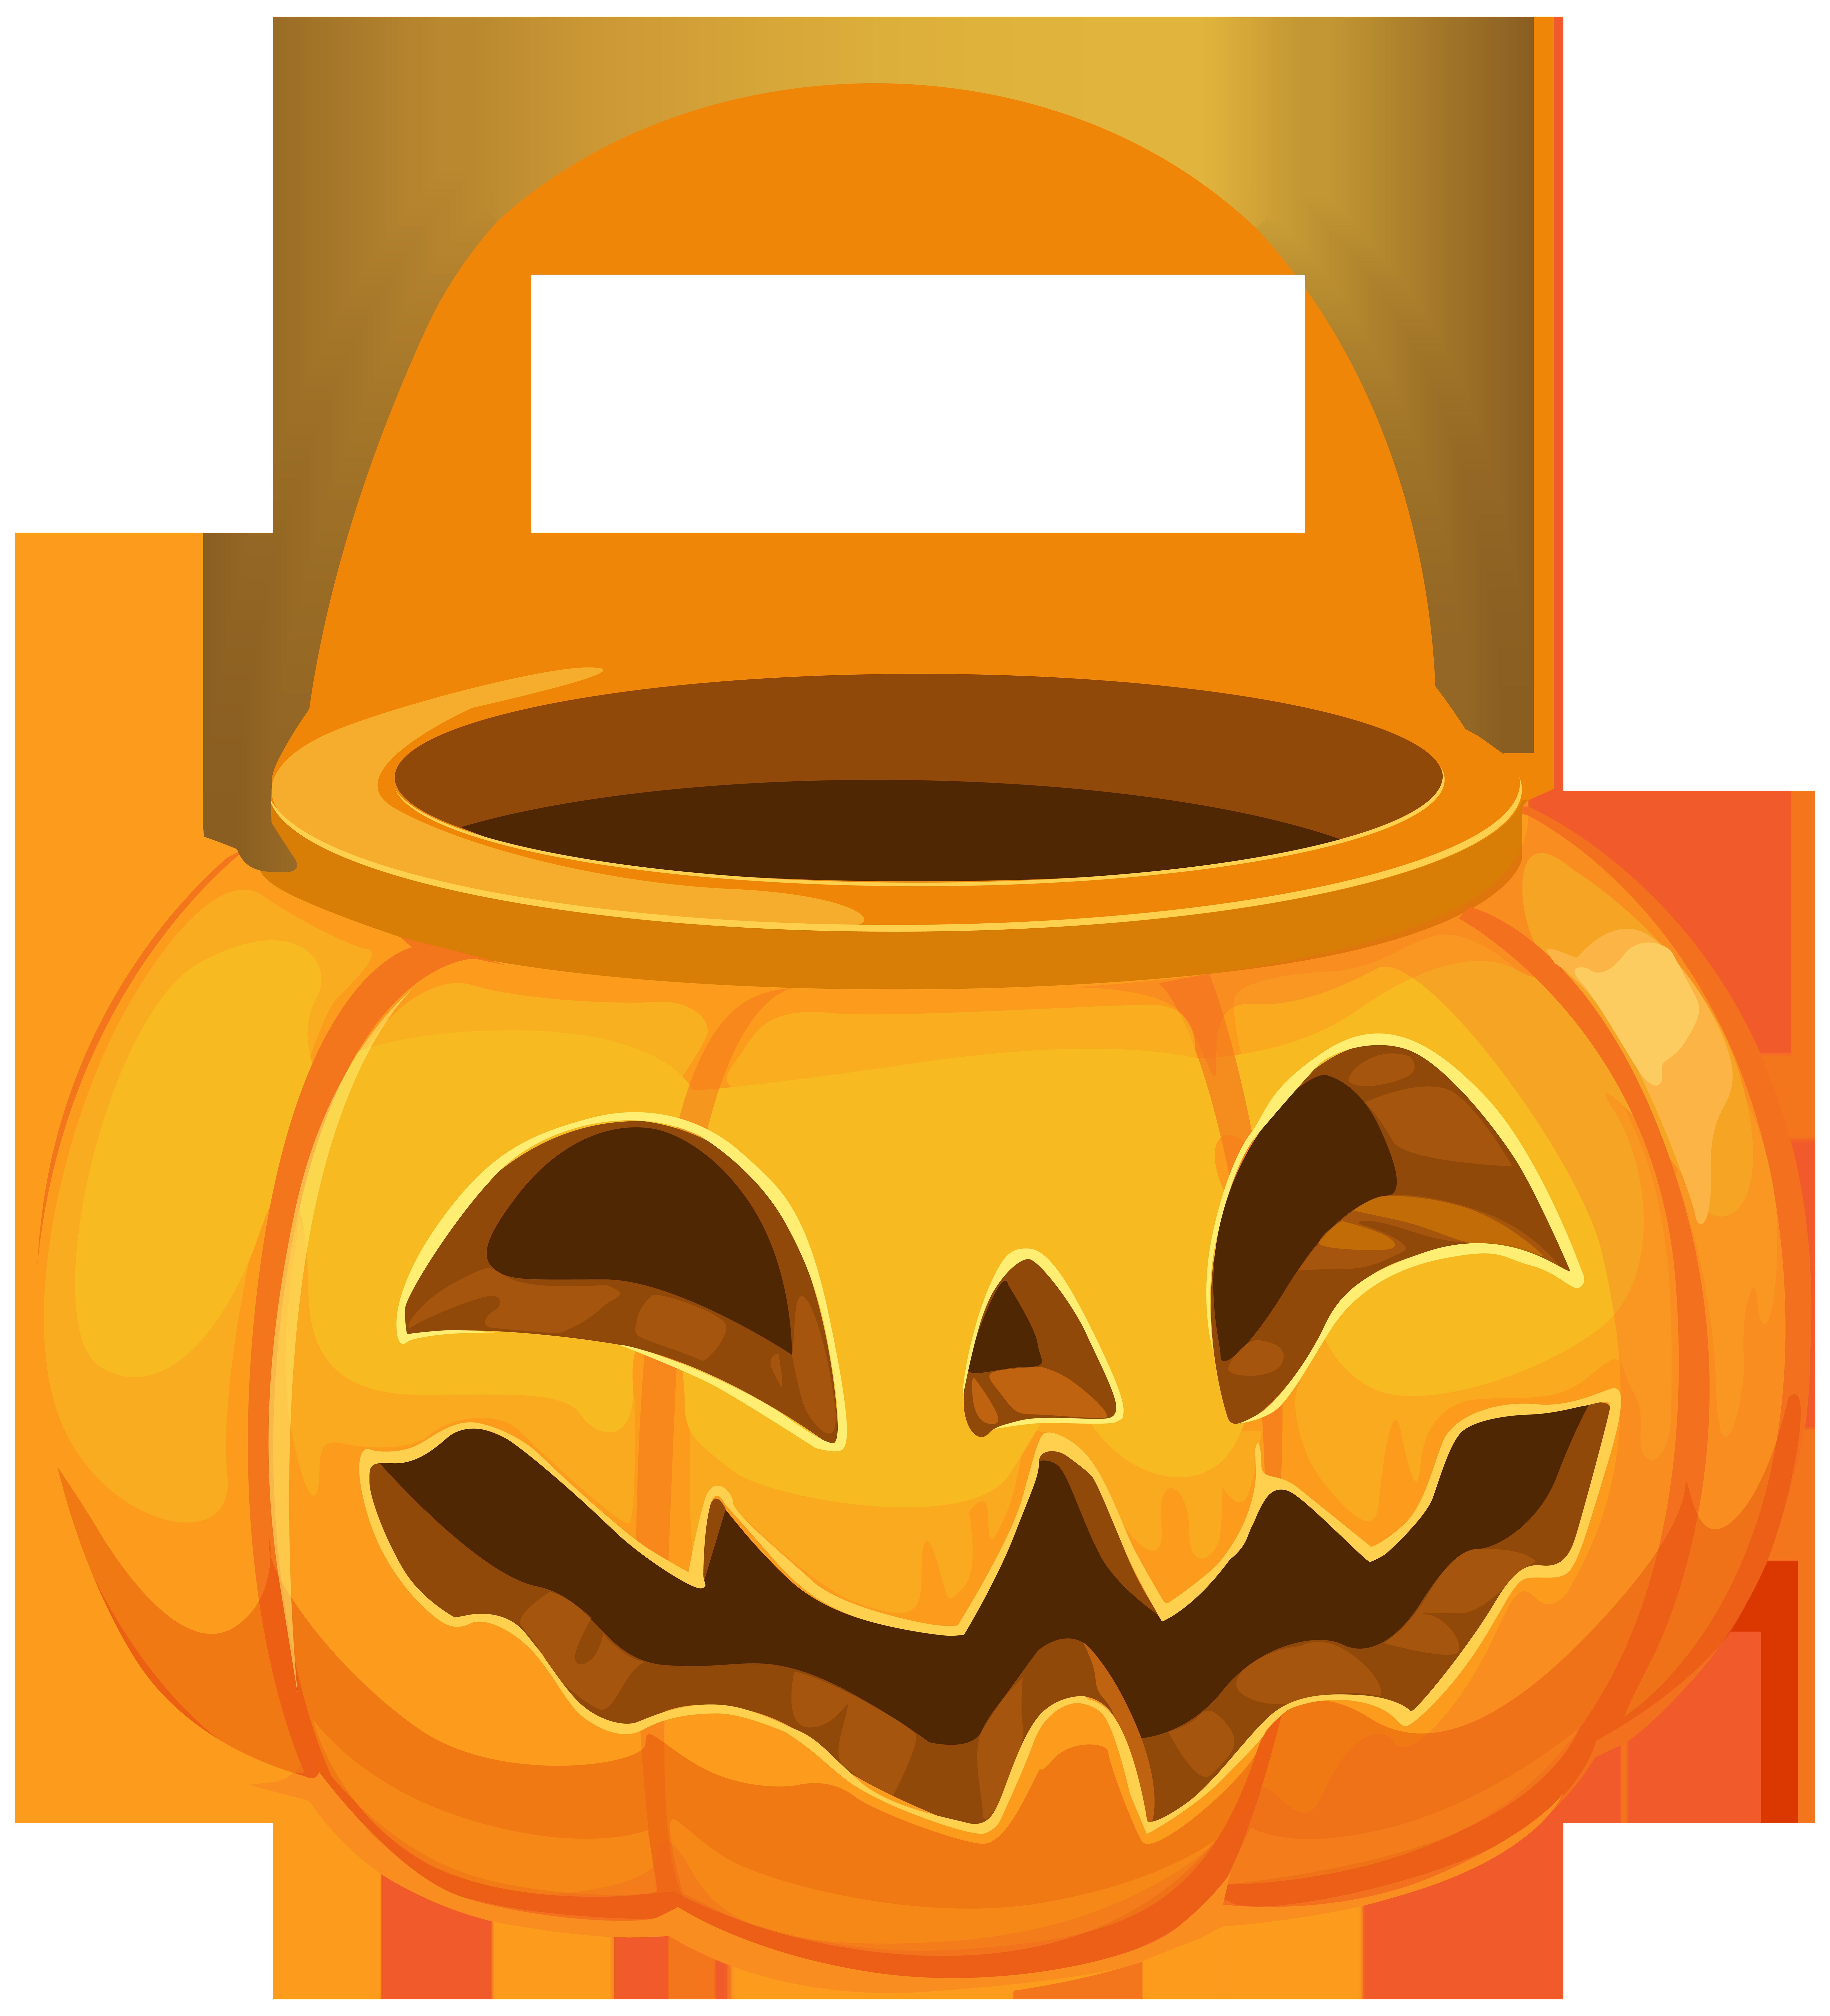 Png clip art image. Pumpkin clipart basket